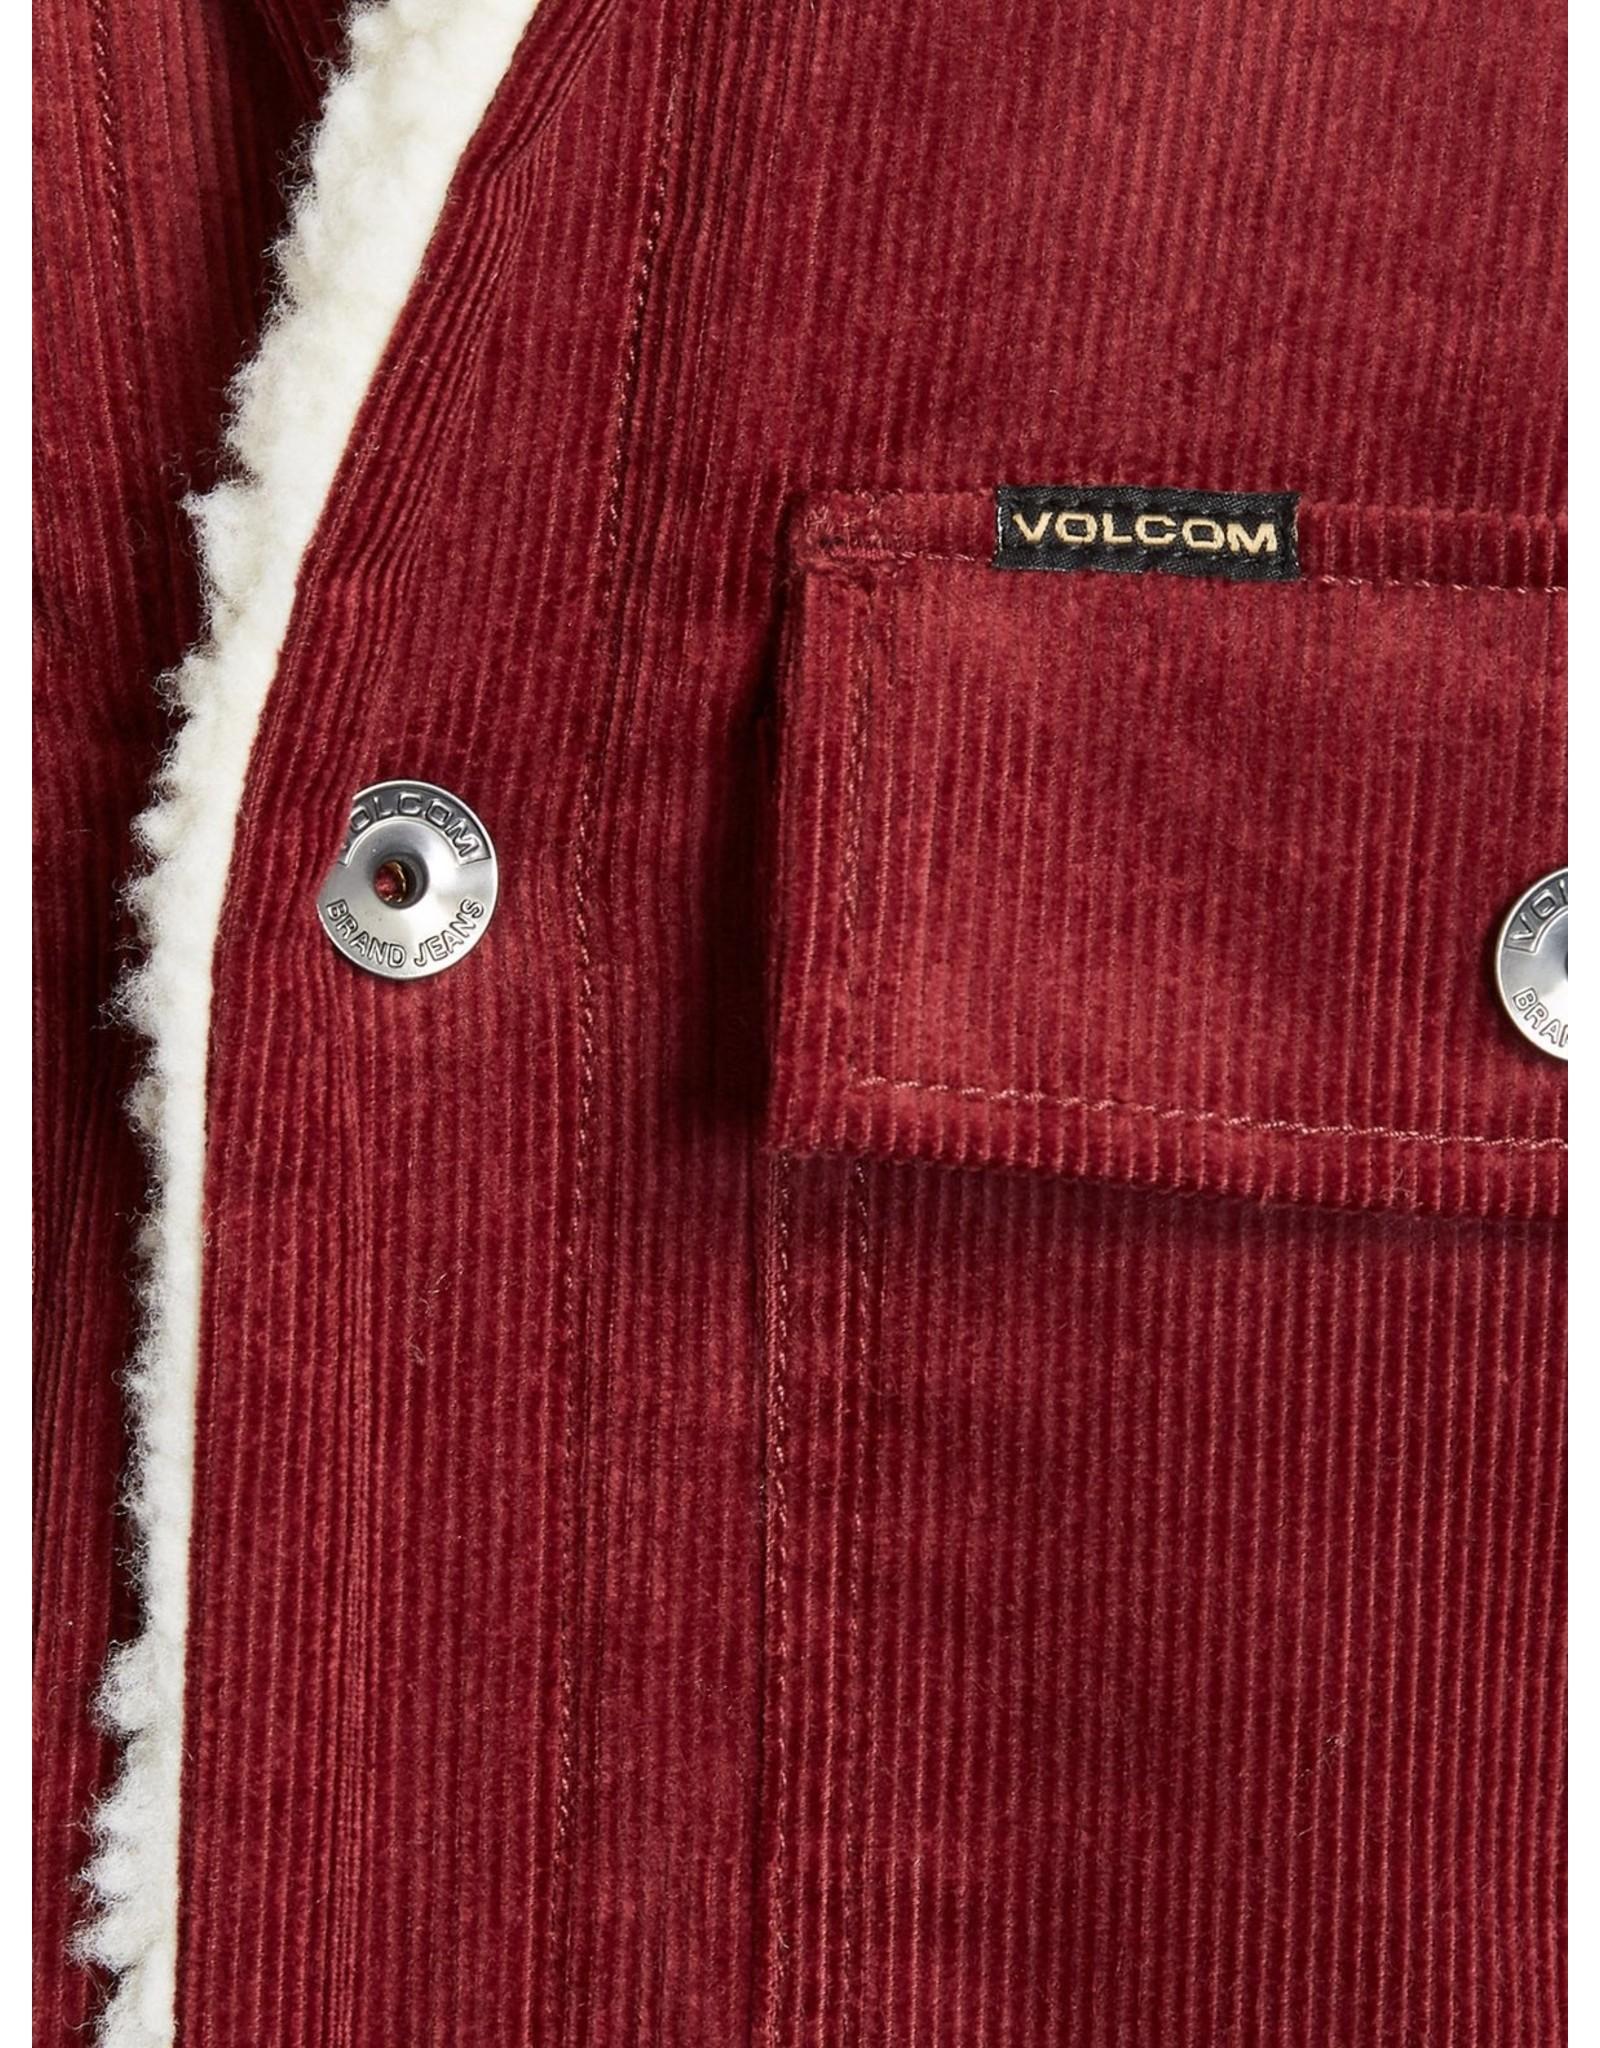 Volcom Keaton Jacket - Port